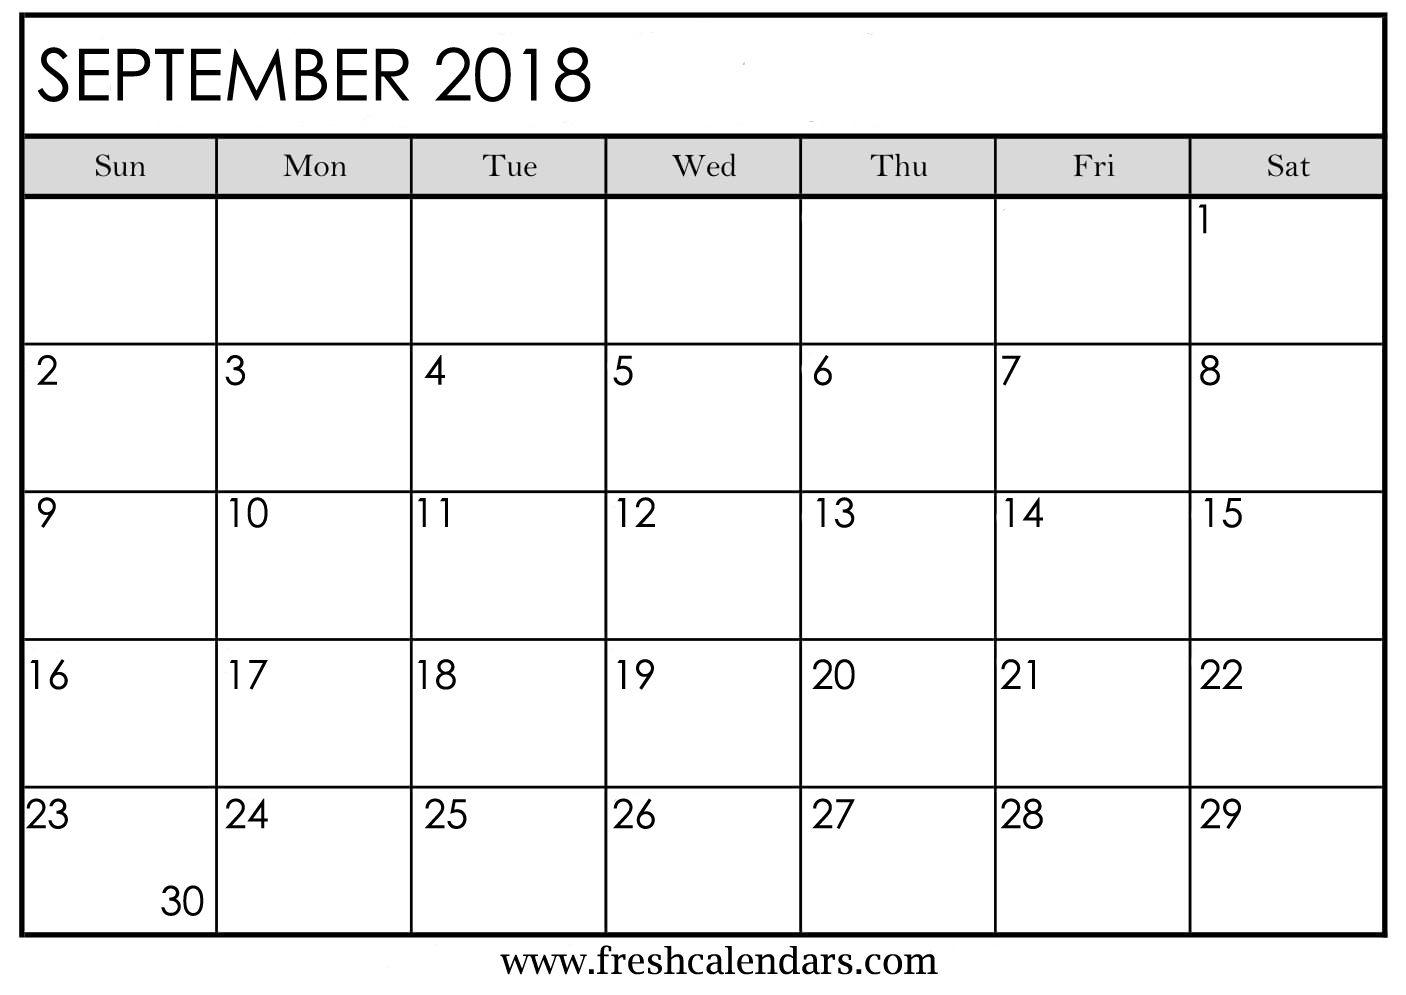 September 2018 Calendar Printable - Fresh Calendars throughout Blank Monthly Calendar September